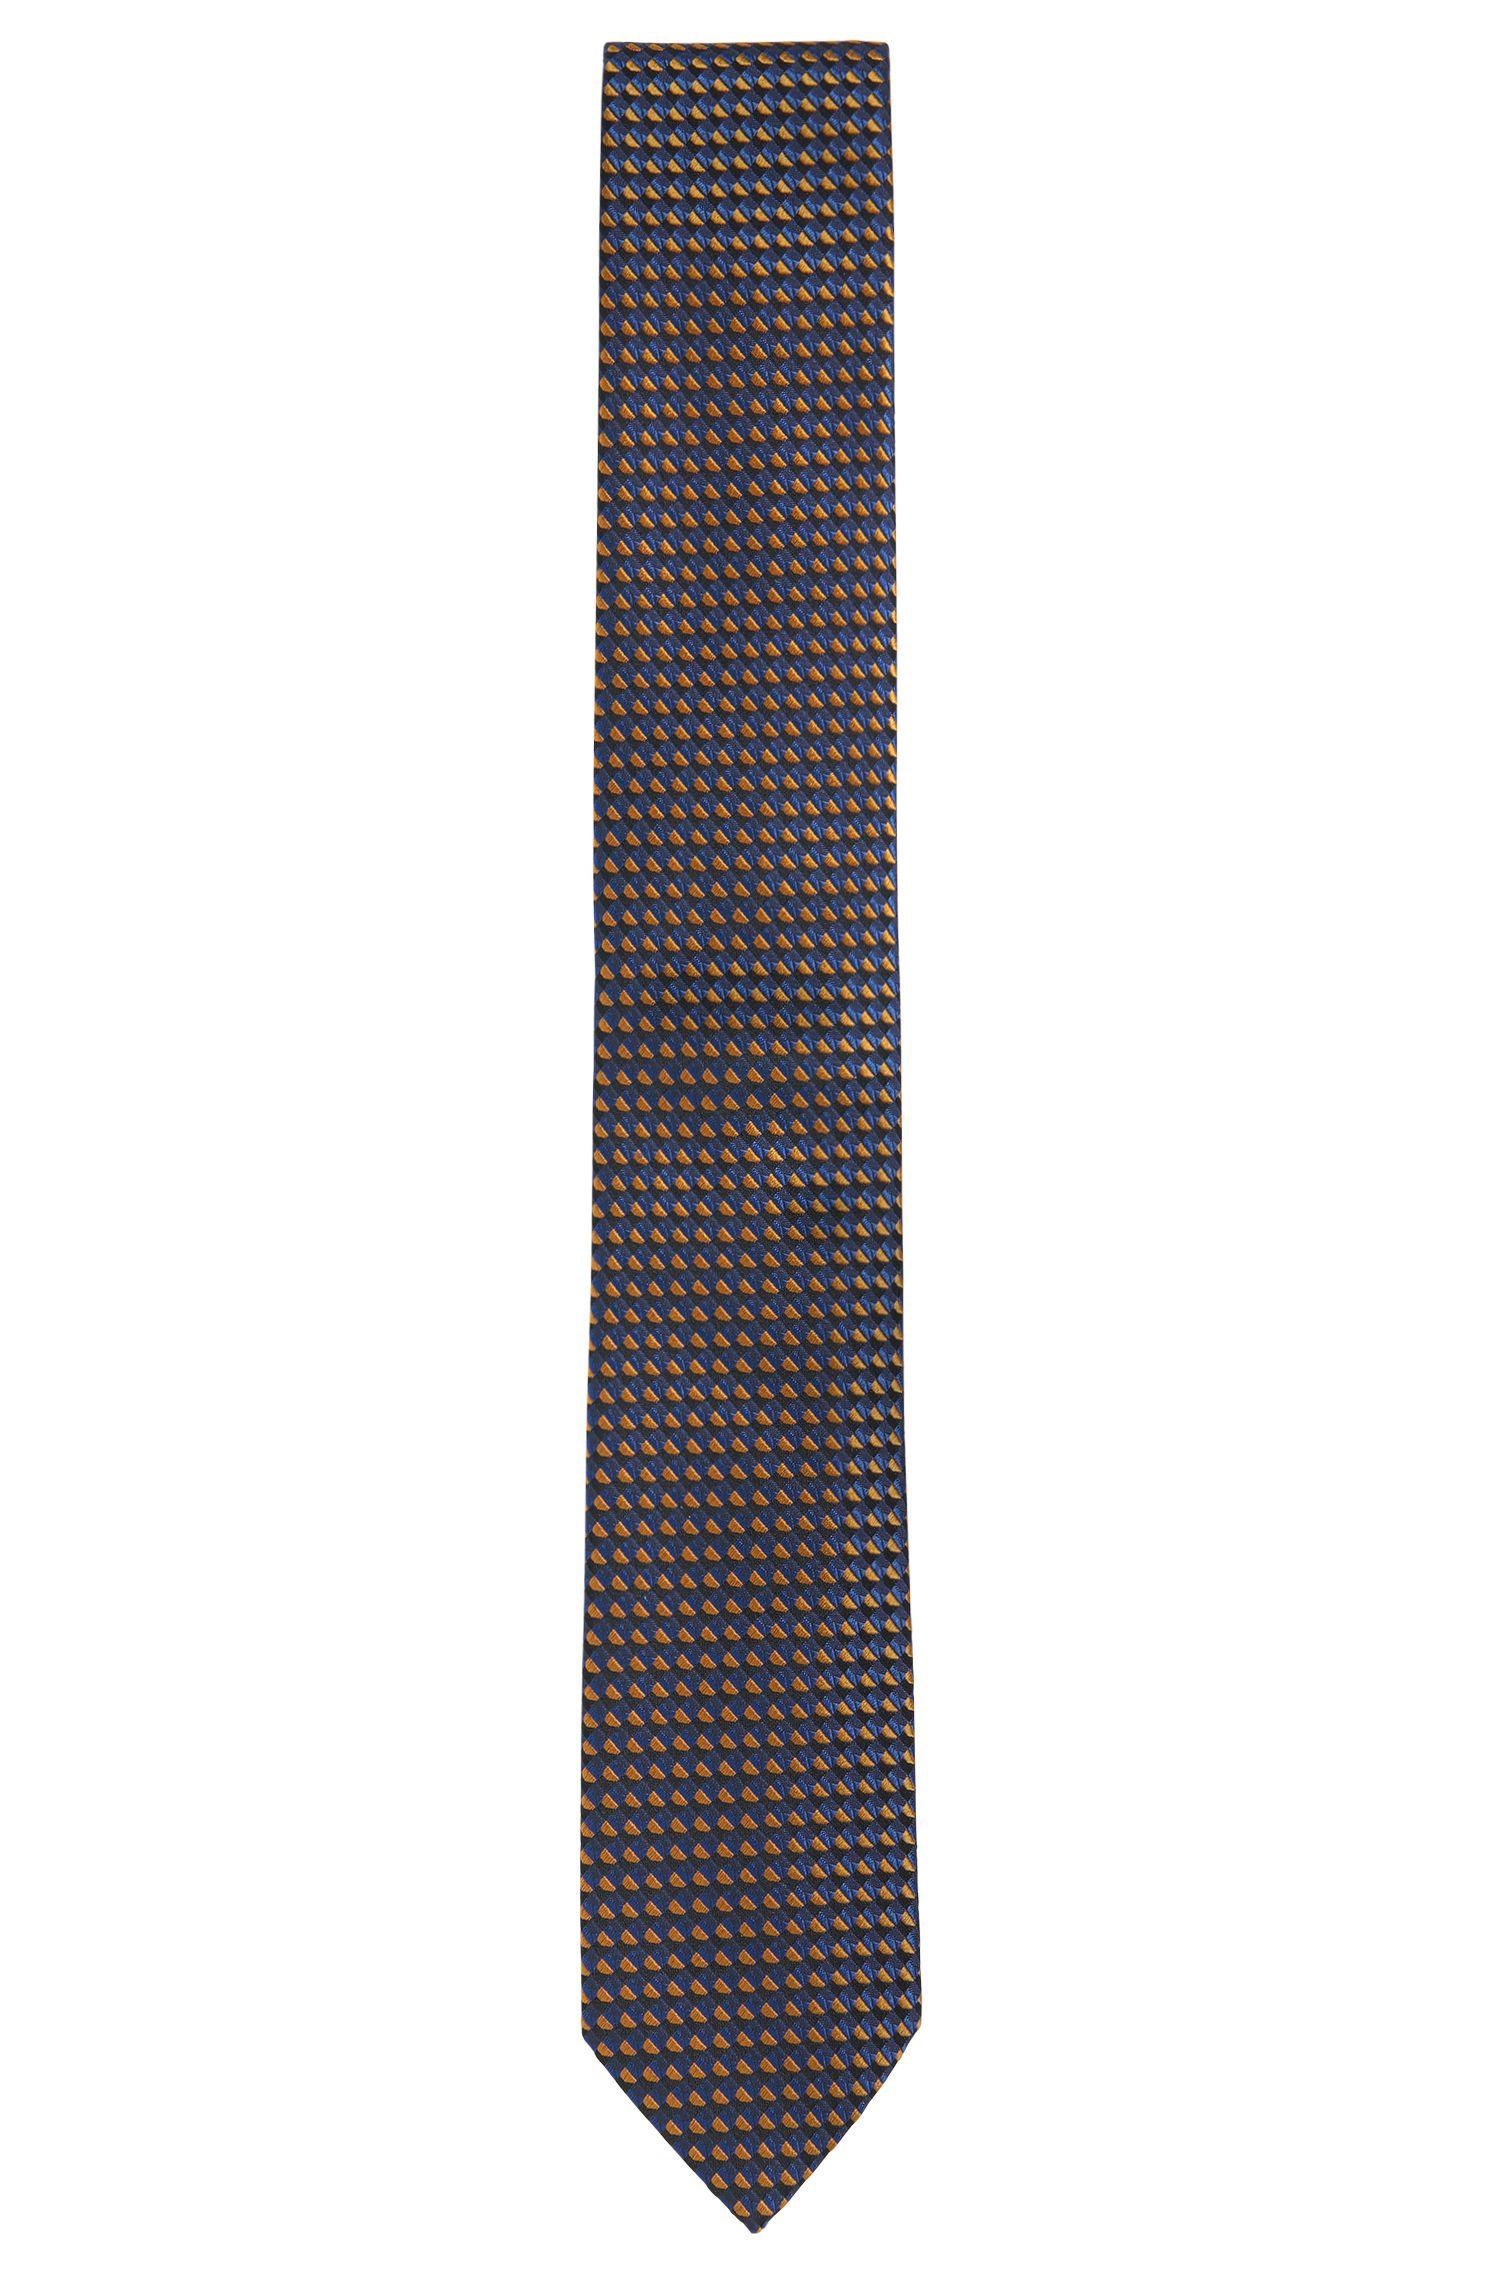 Krawatte aus Seide mit Grafik-Muster: 'Tie cm 7'